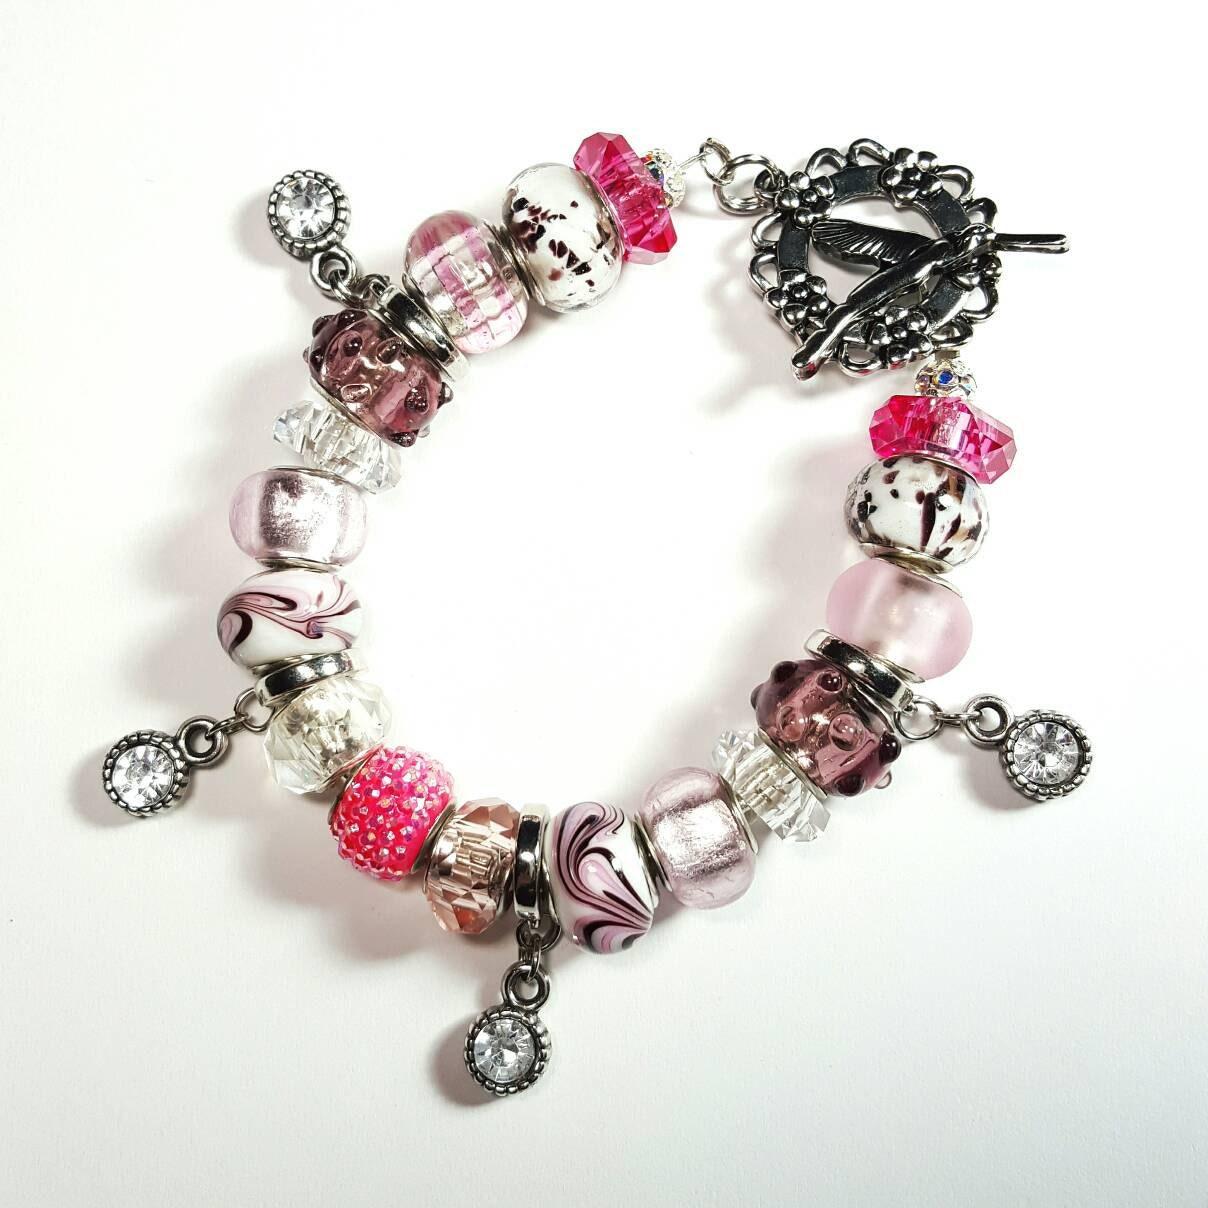 7ea568e2b0 SALE Pandora Bracelet w/Plum Spike Glass Beads/Pink Rhinestone  Beads/Shimmer Glass Beads/Swirl & Spotted/Silver Crystal Charms FREE  SHIPPING